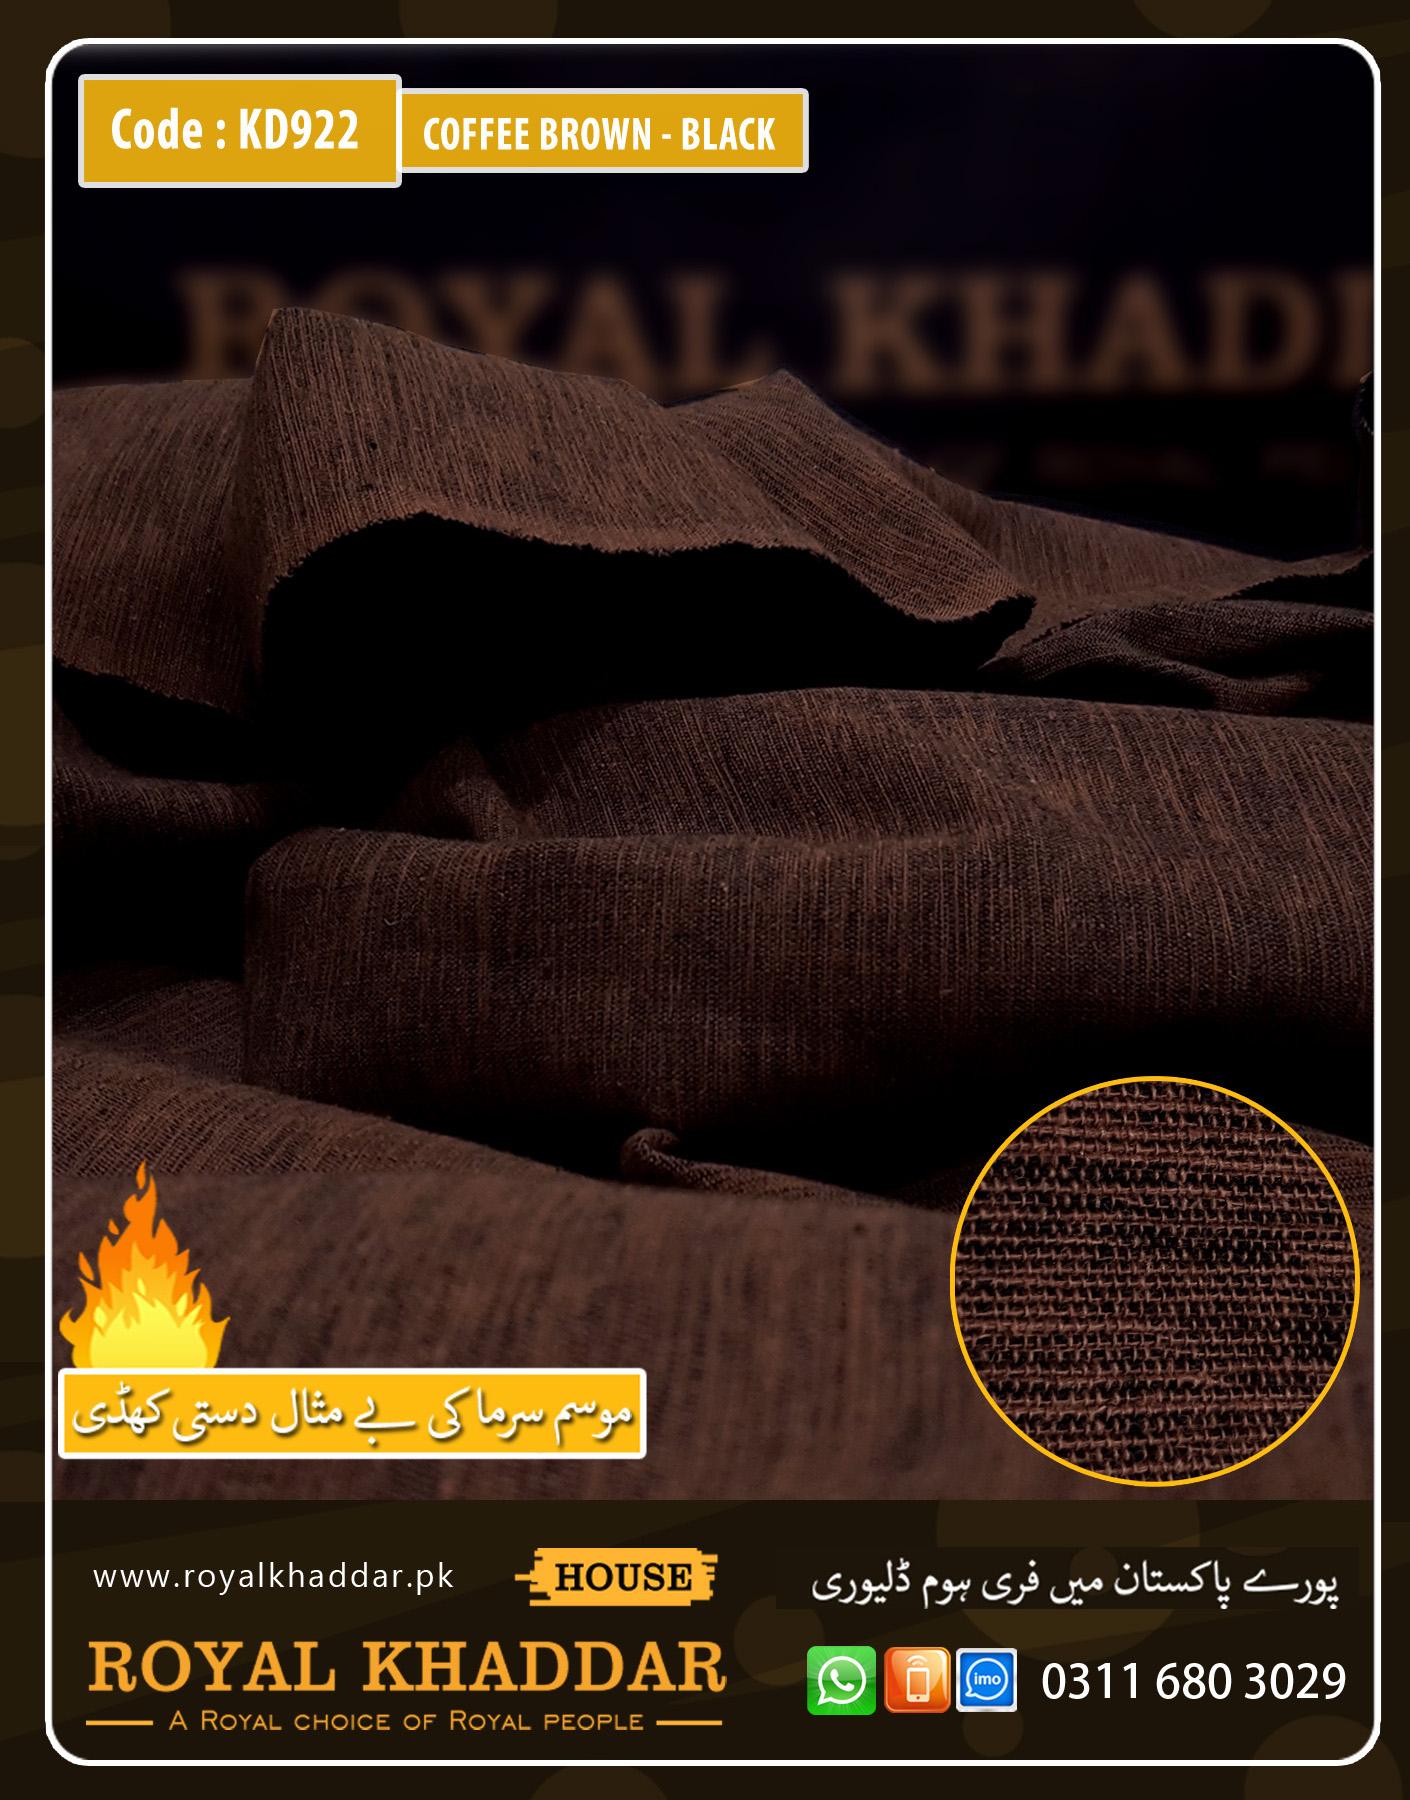 Coffee Brown - Black Handmade Khaddi